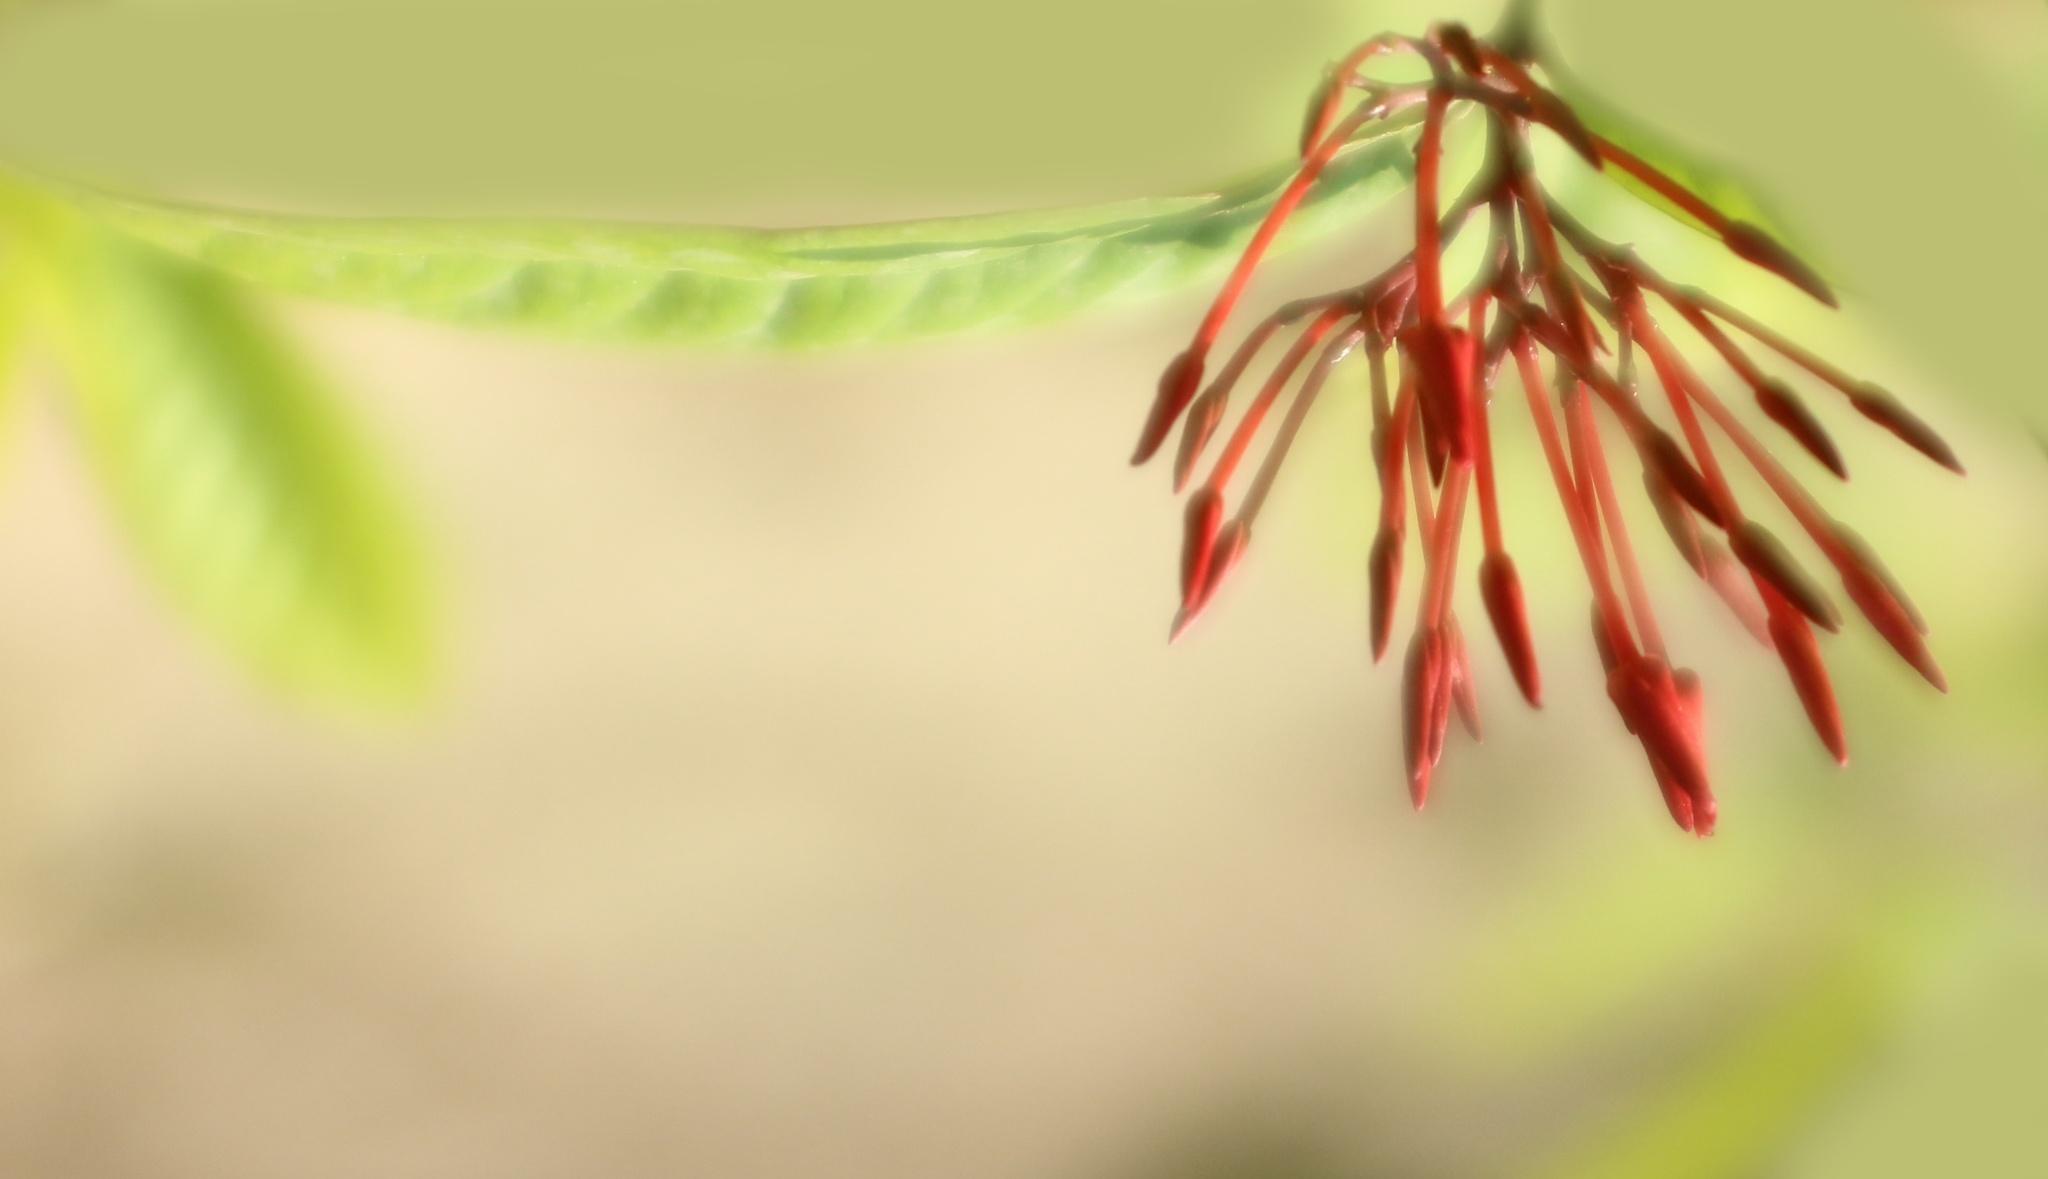 slender-tender floral forms by GitiThadani